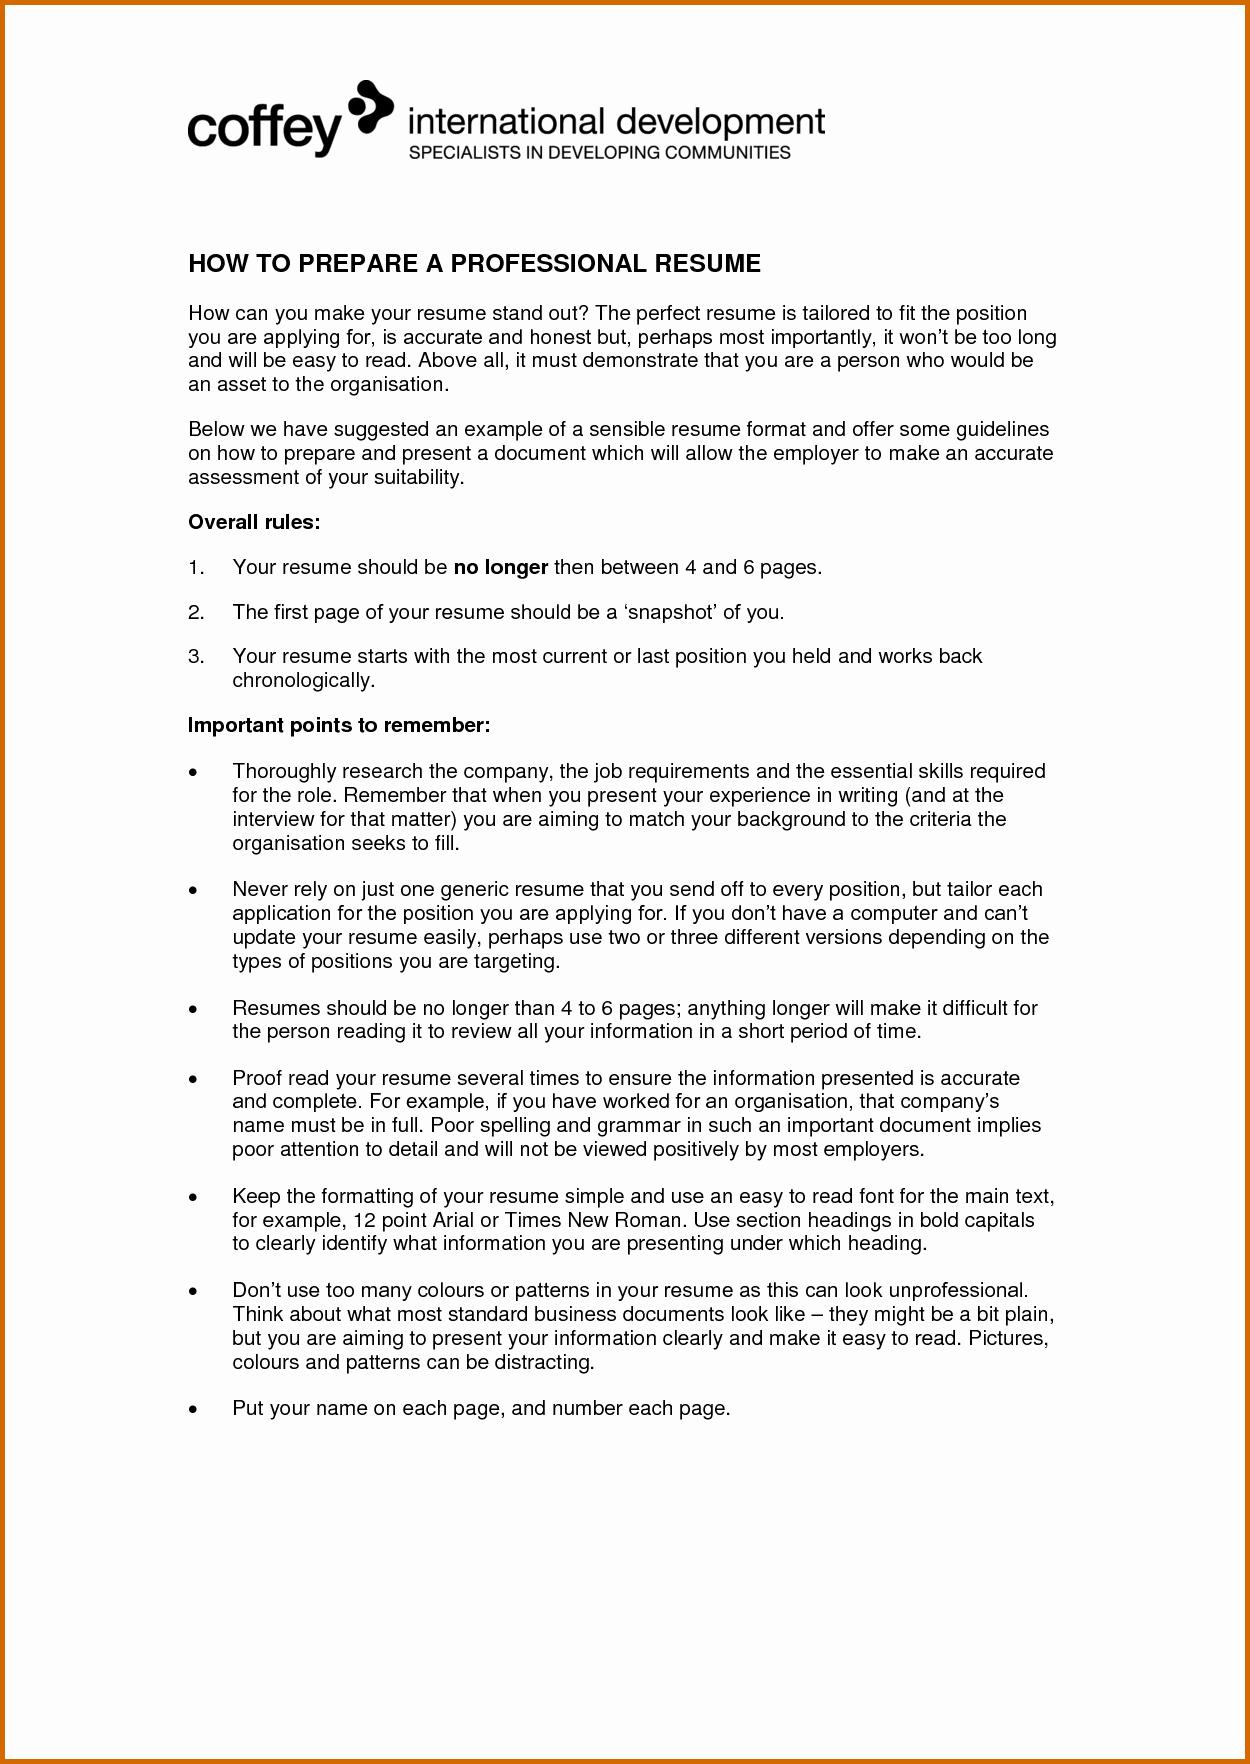 7 How to Prepare Resume